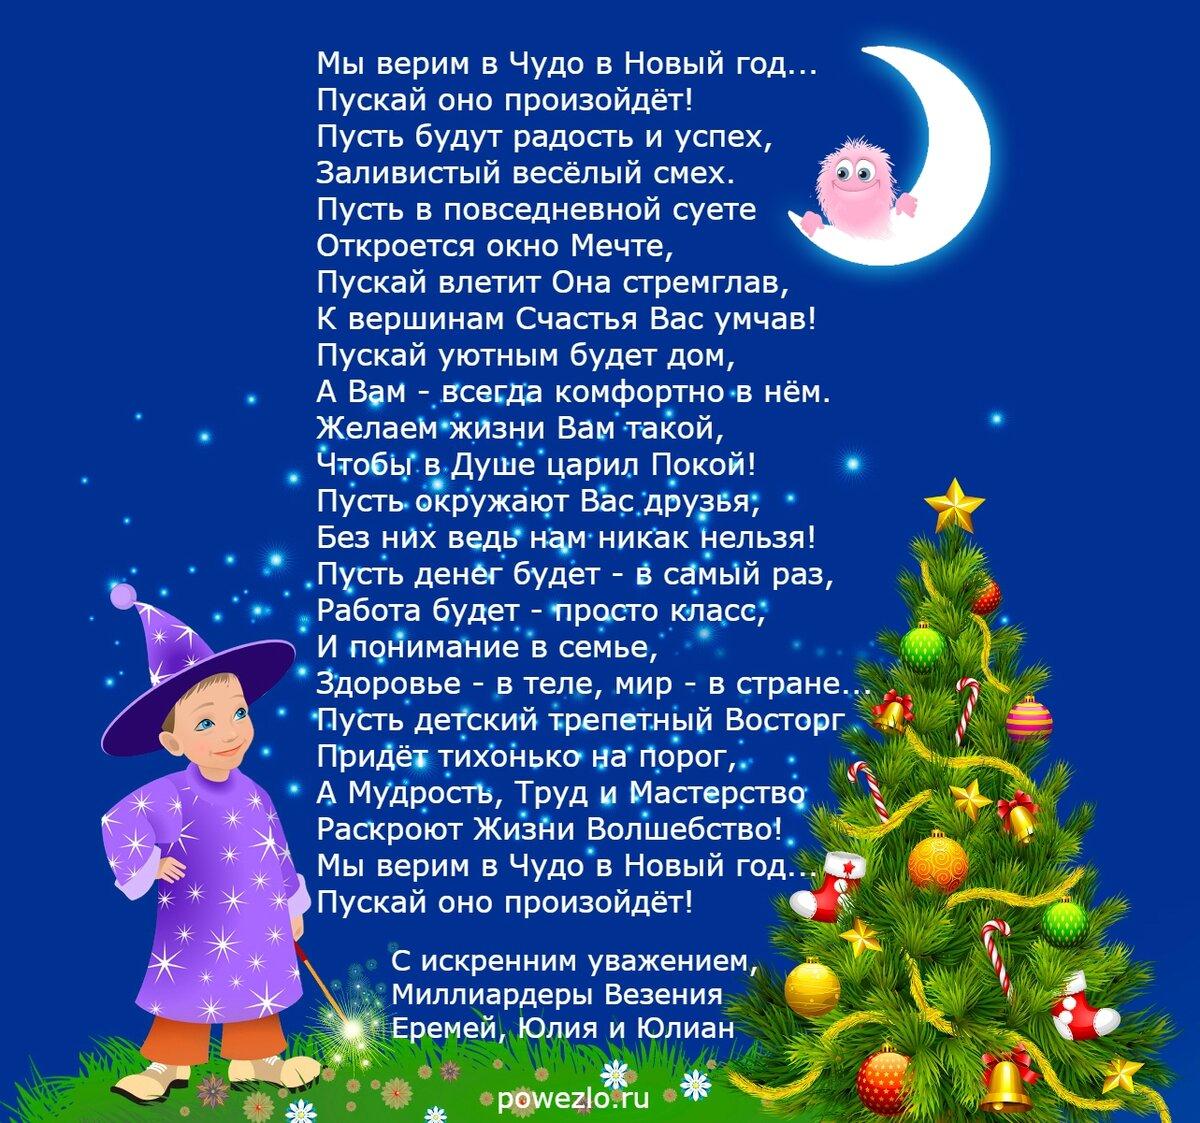 недуга стихи про новогоднее чудо кауфман